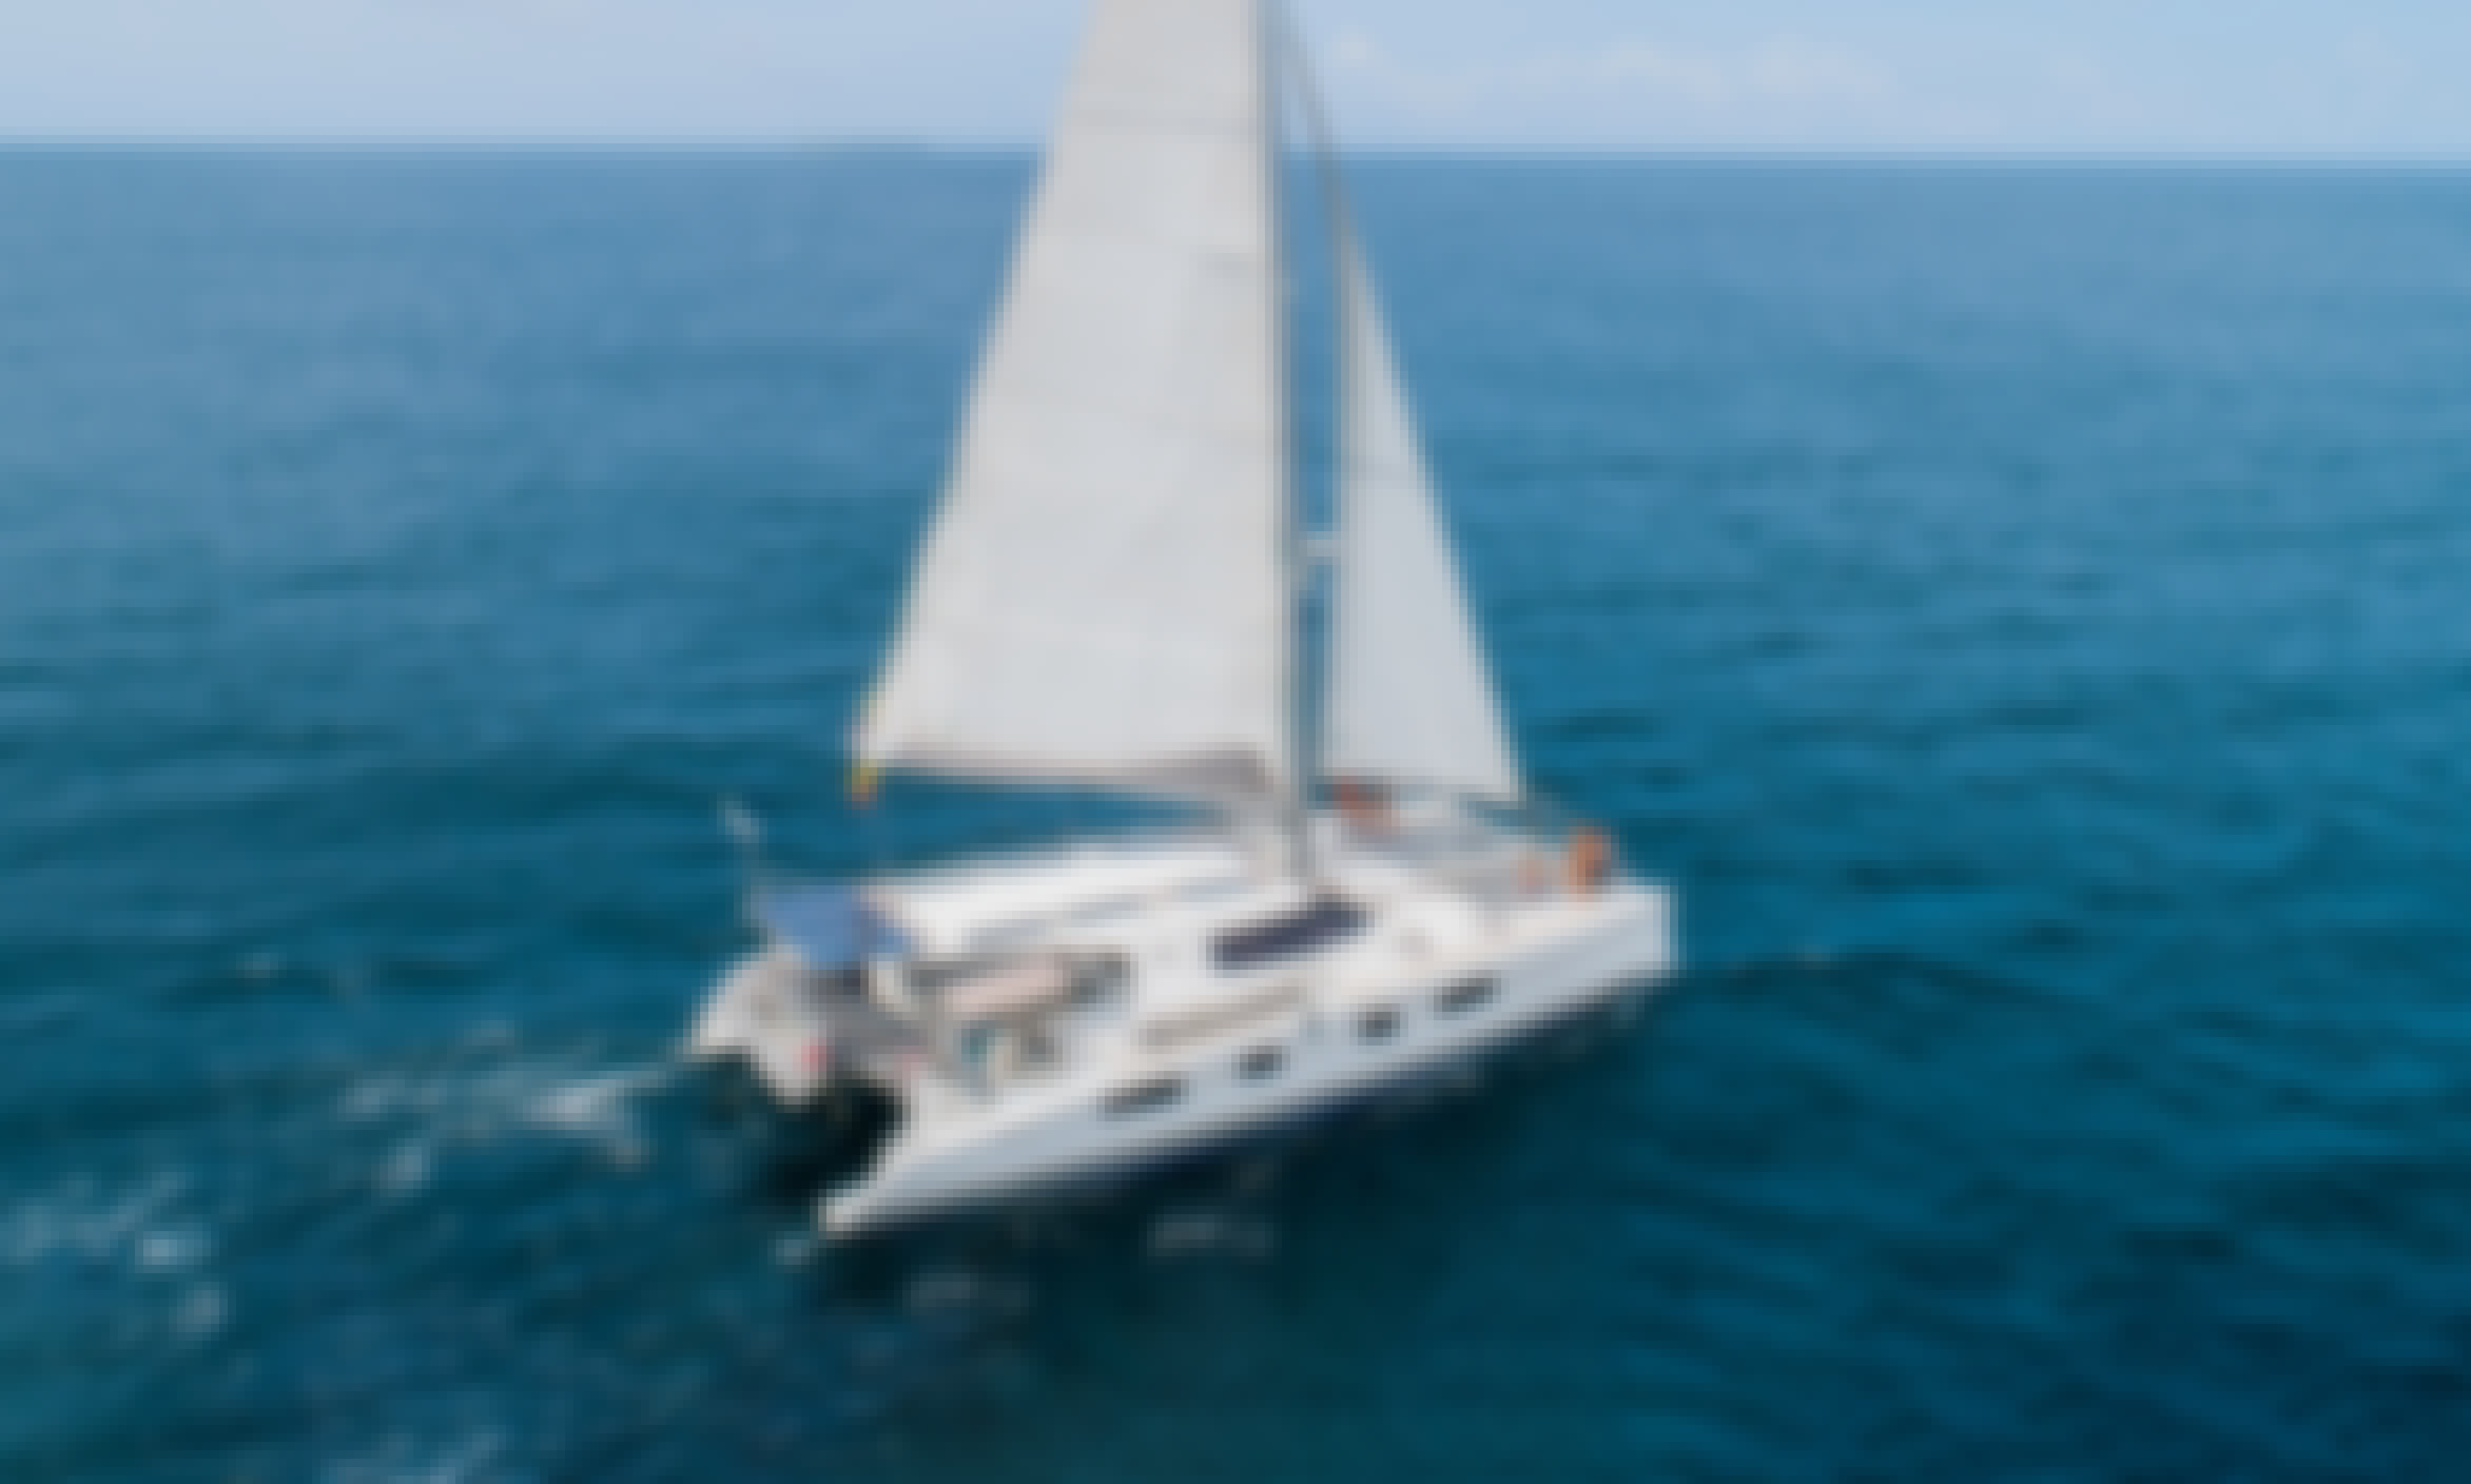 Get onboard on our beautiful 48' Sailing Catamaran in Cartagena, Bolívar